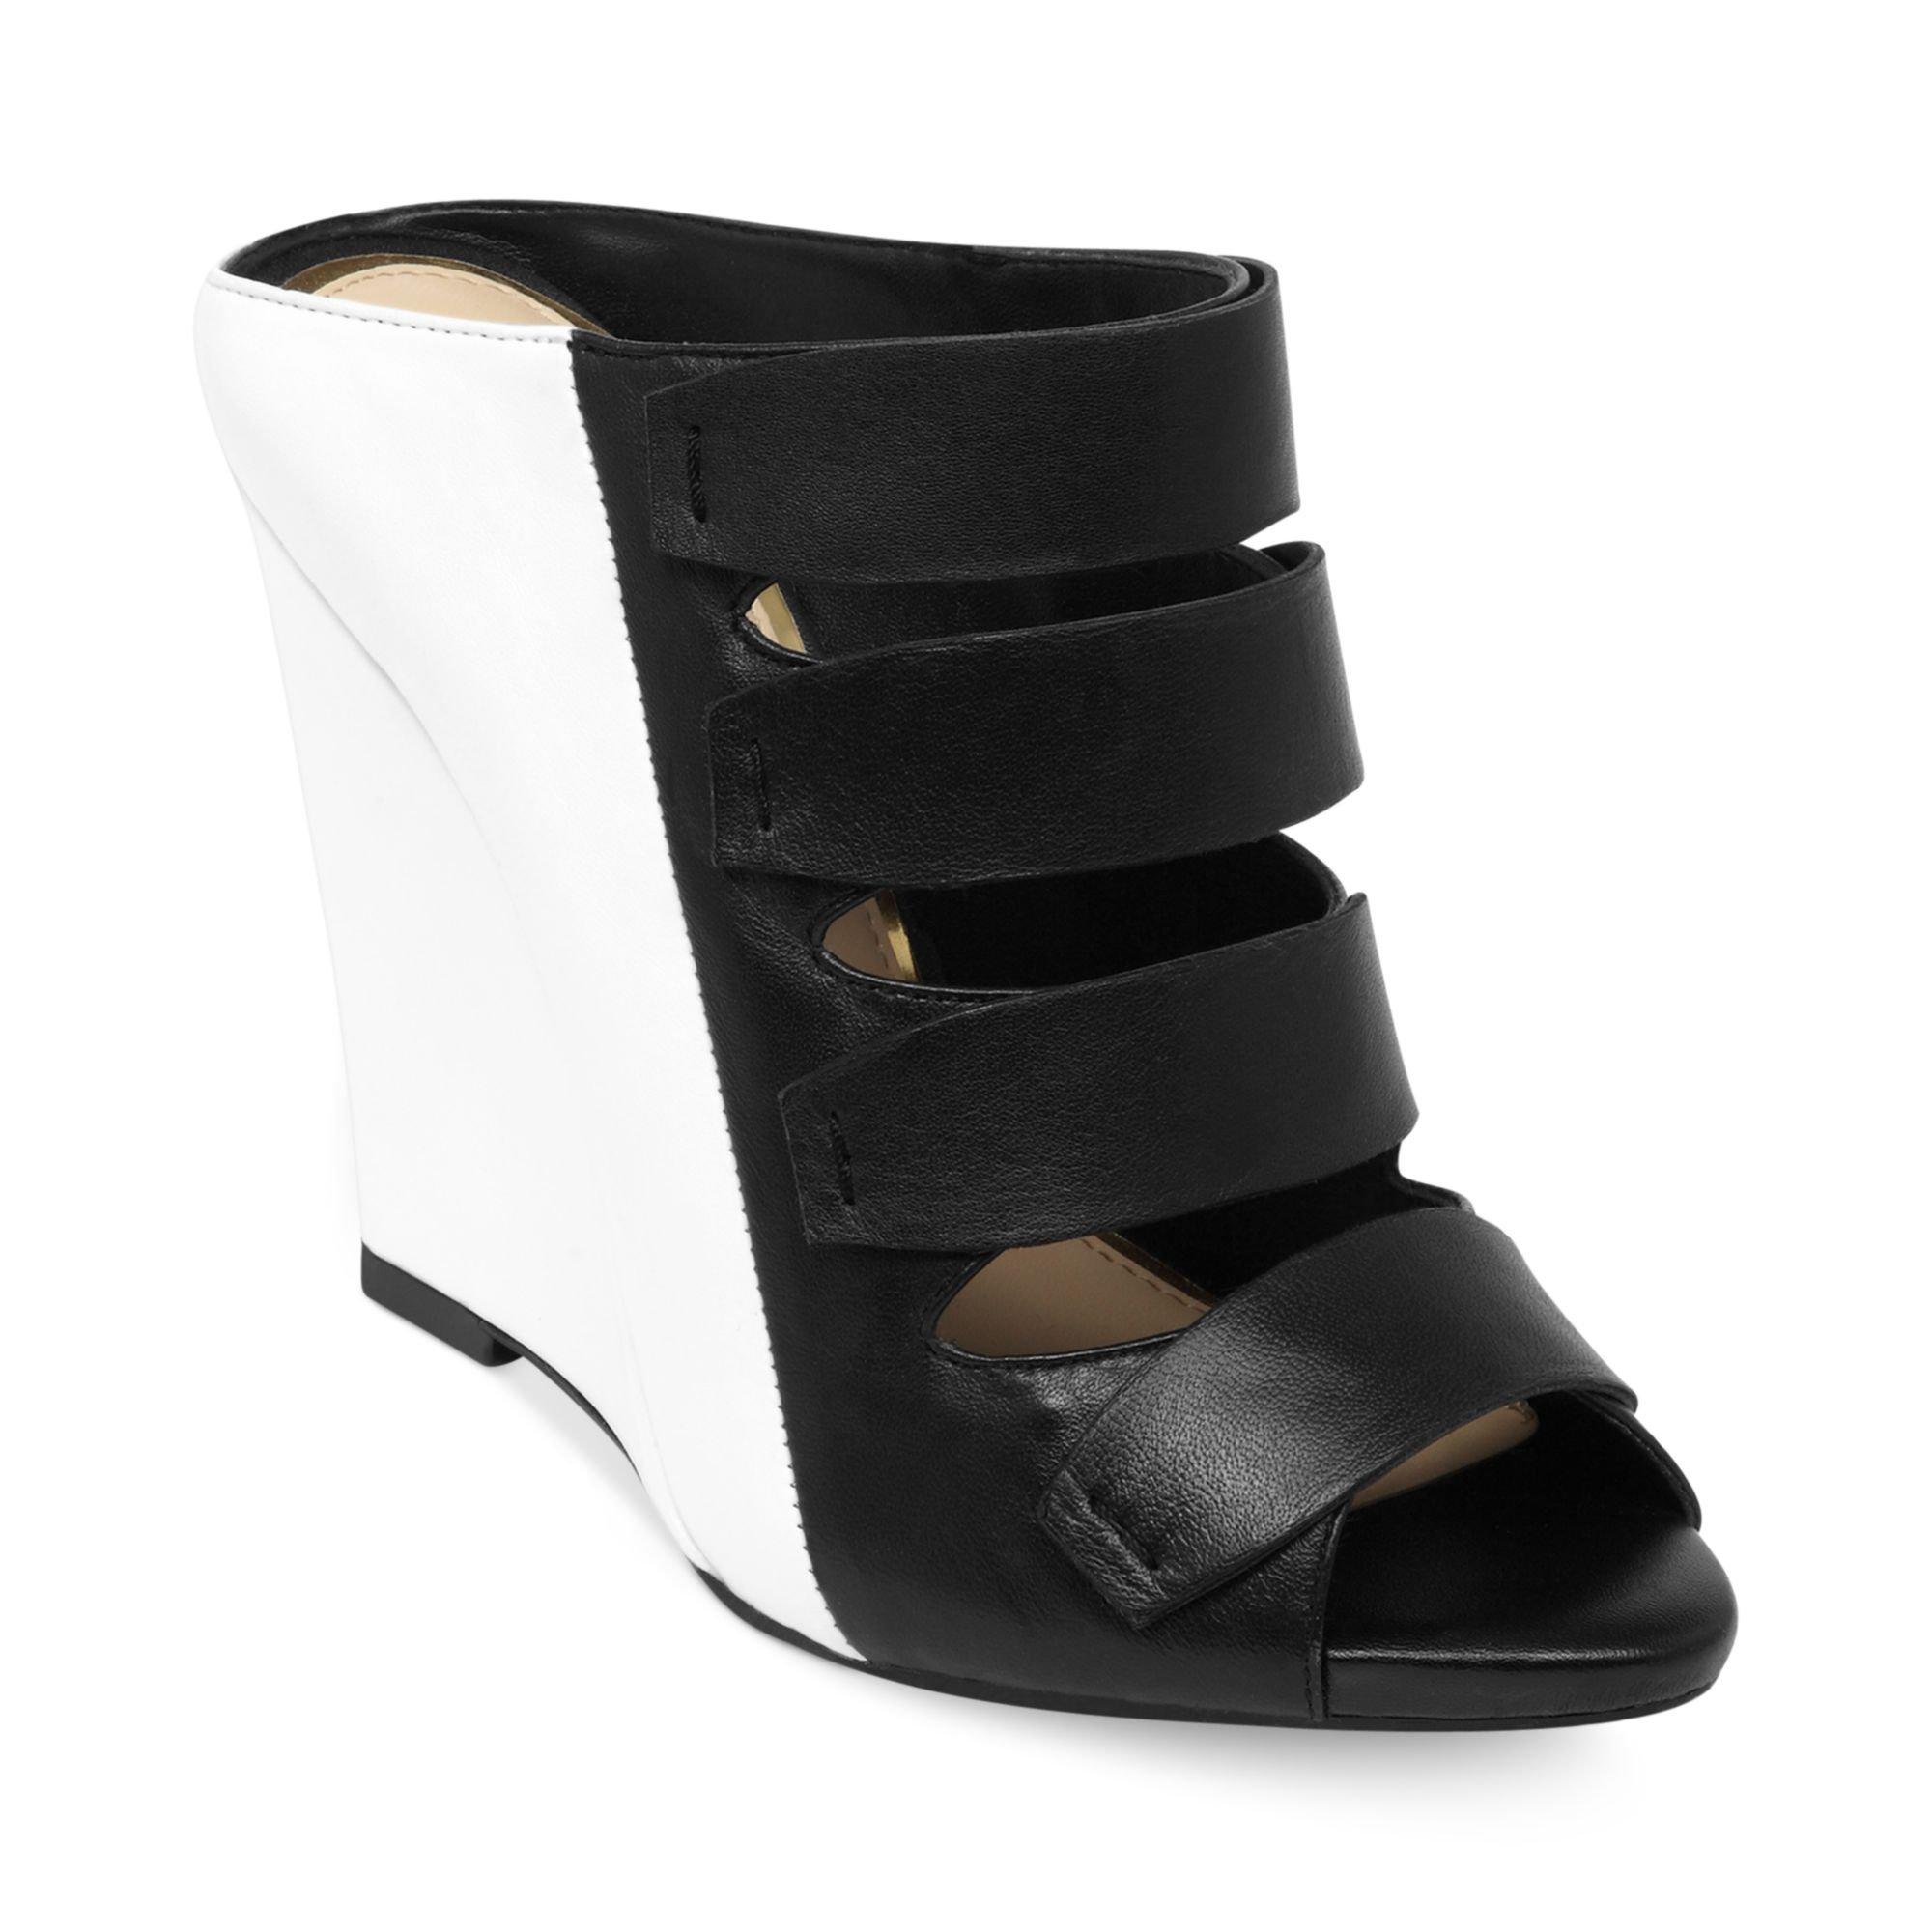 Jessica Simpson Marah Wedge Sandals In Black Black White